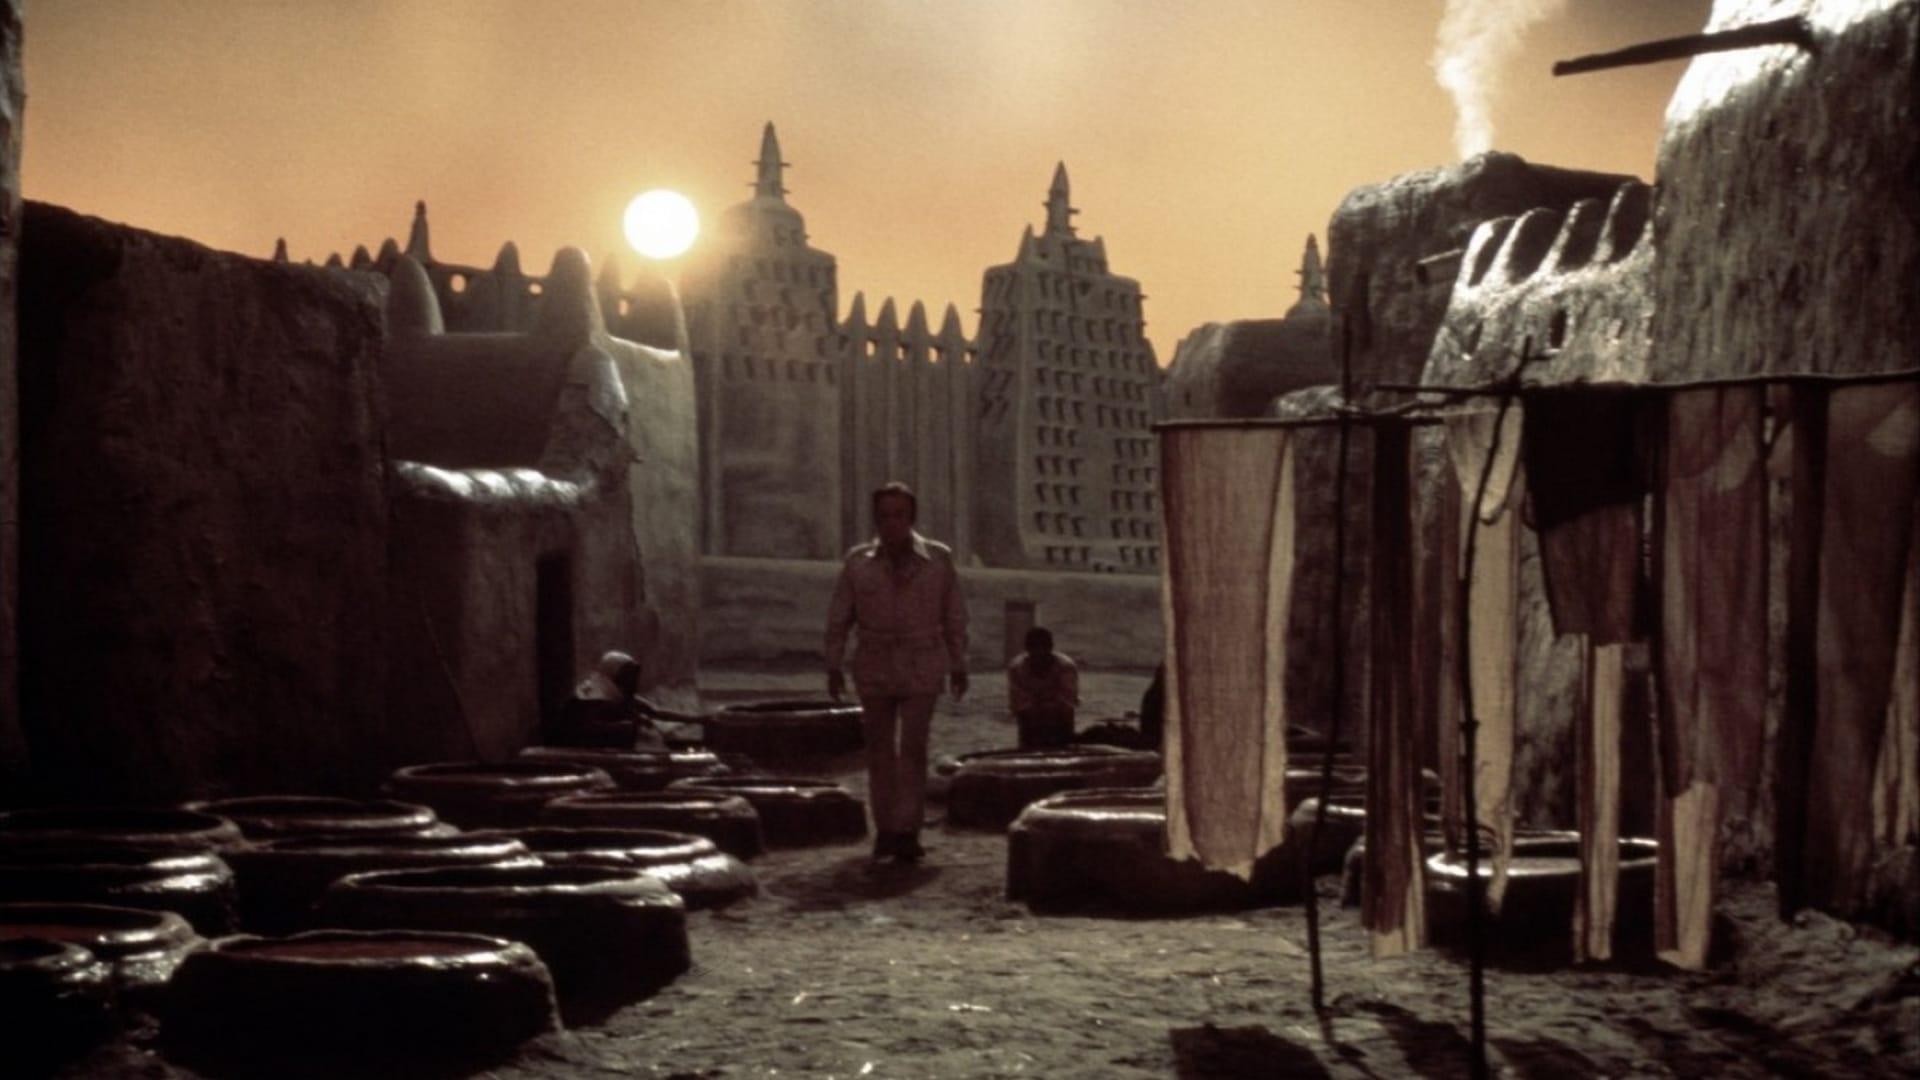 Exorcist II: The Heretic backdrop